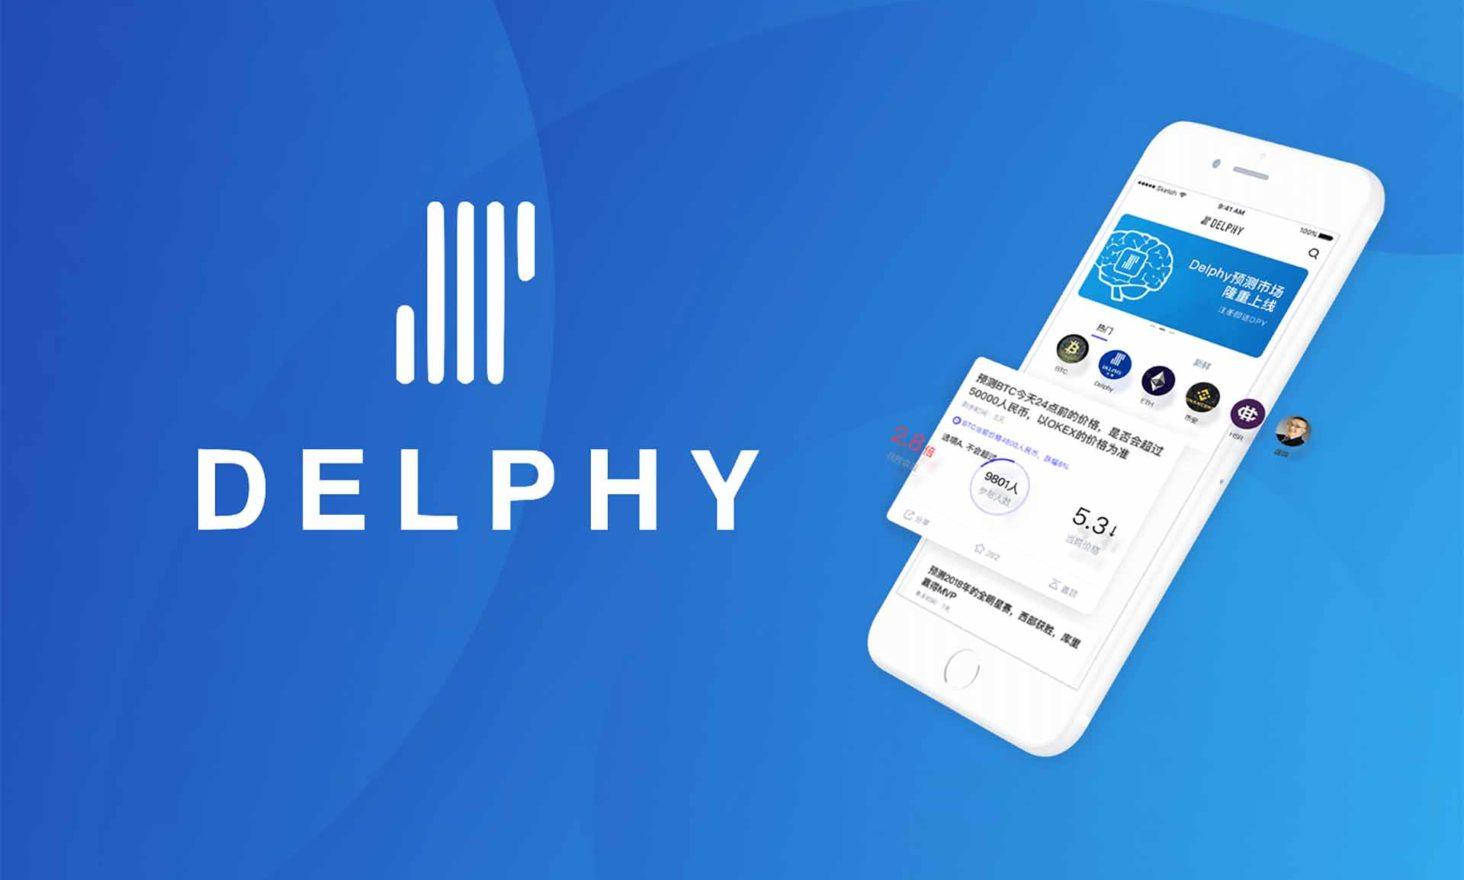 Delphy Surpasses 100,000 Pre-Registration Mark for Its Predictive Markets App